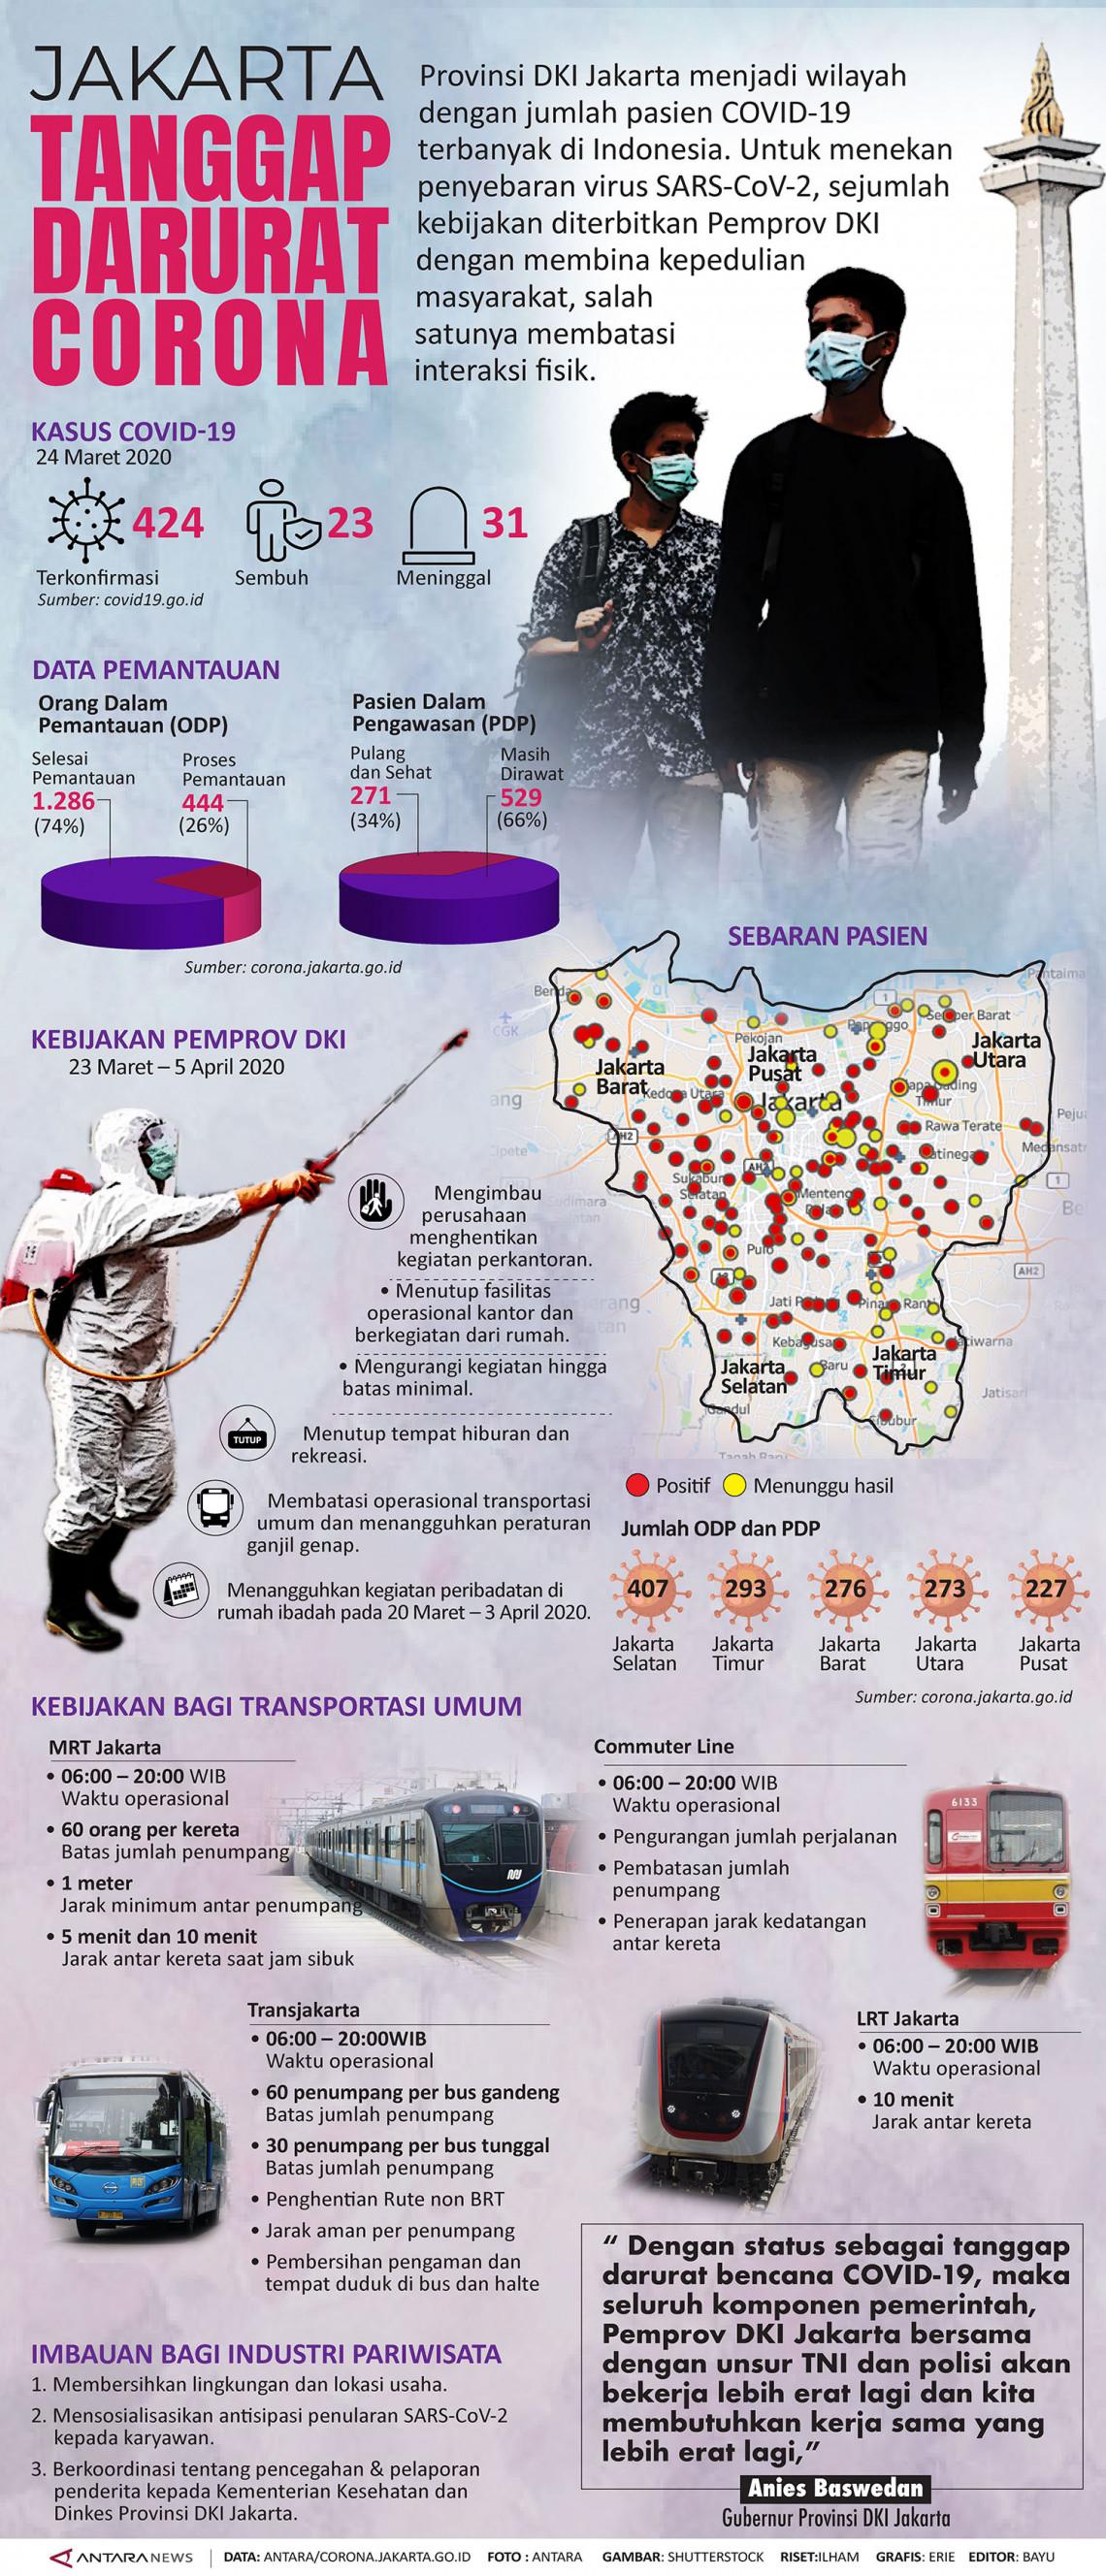 Jakarta tanggap darurat corona